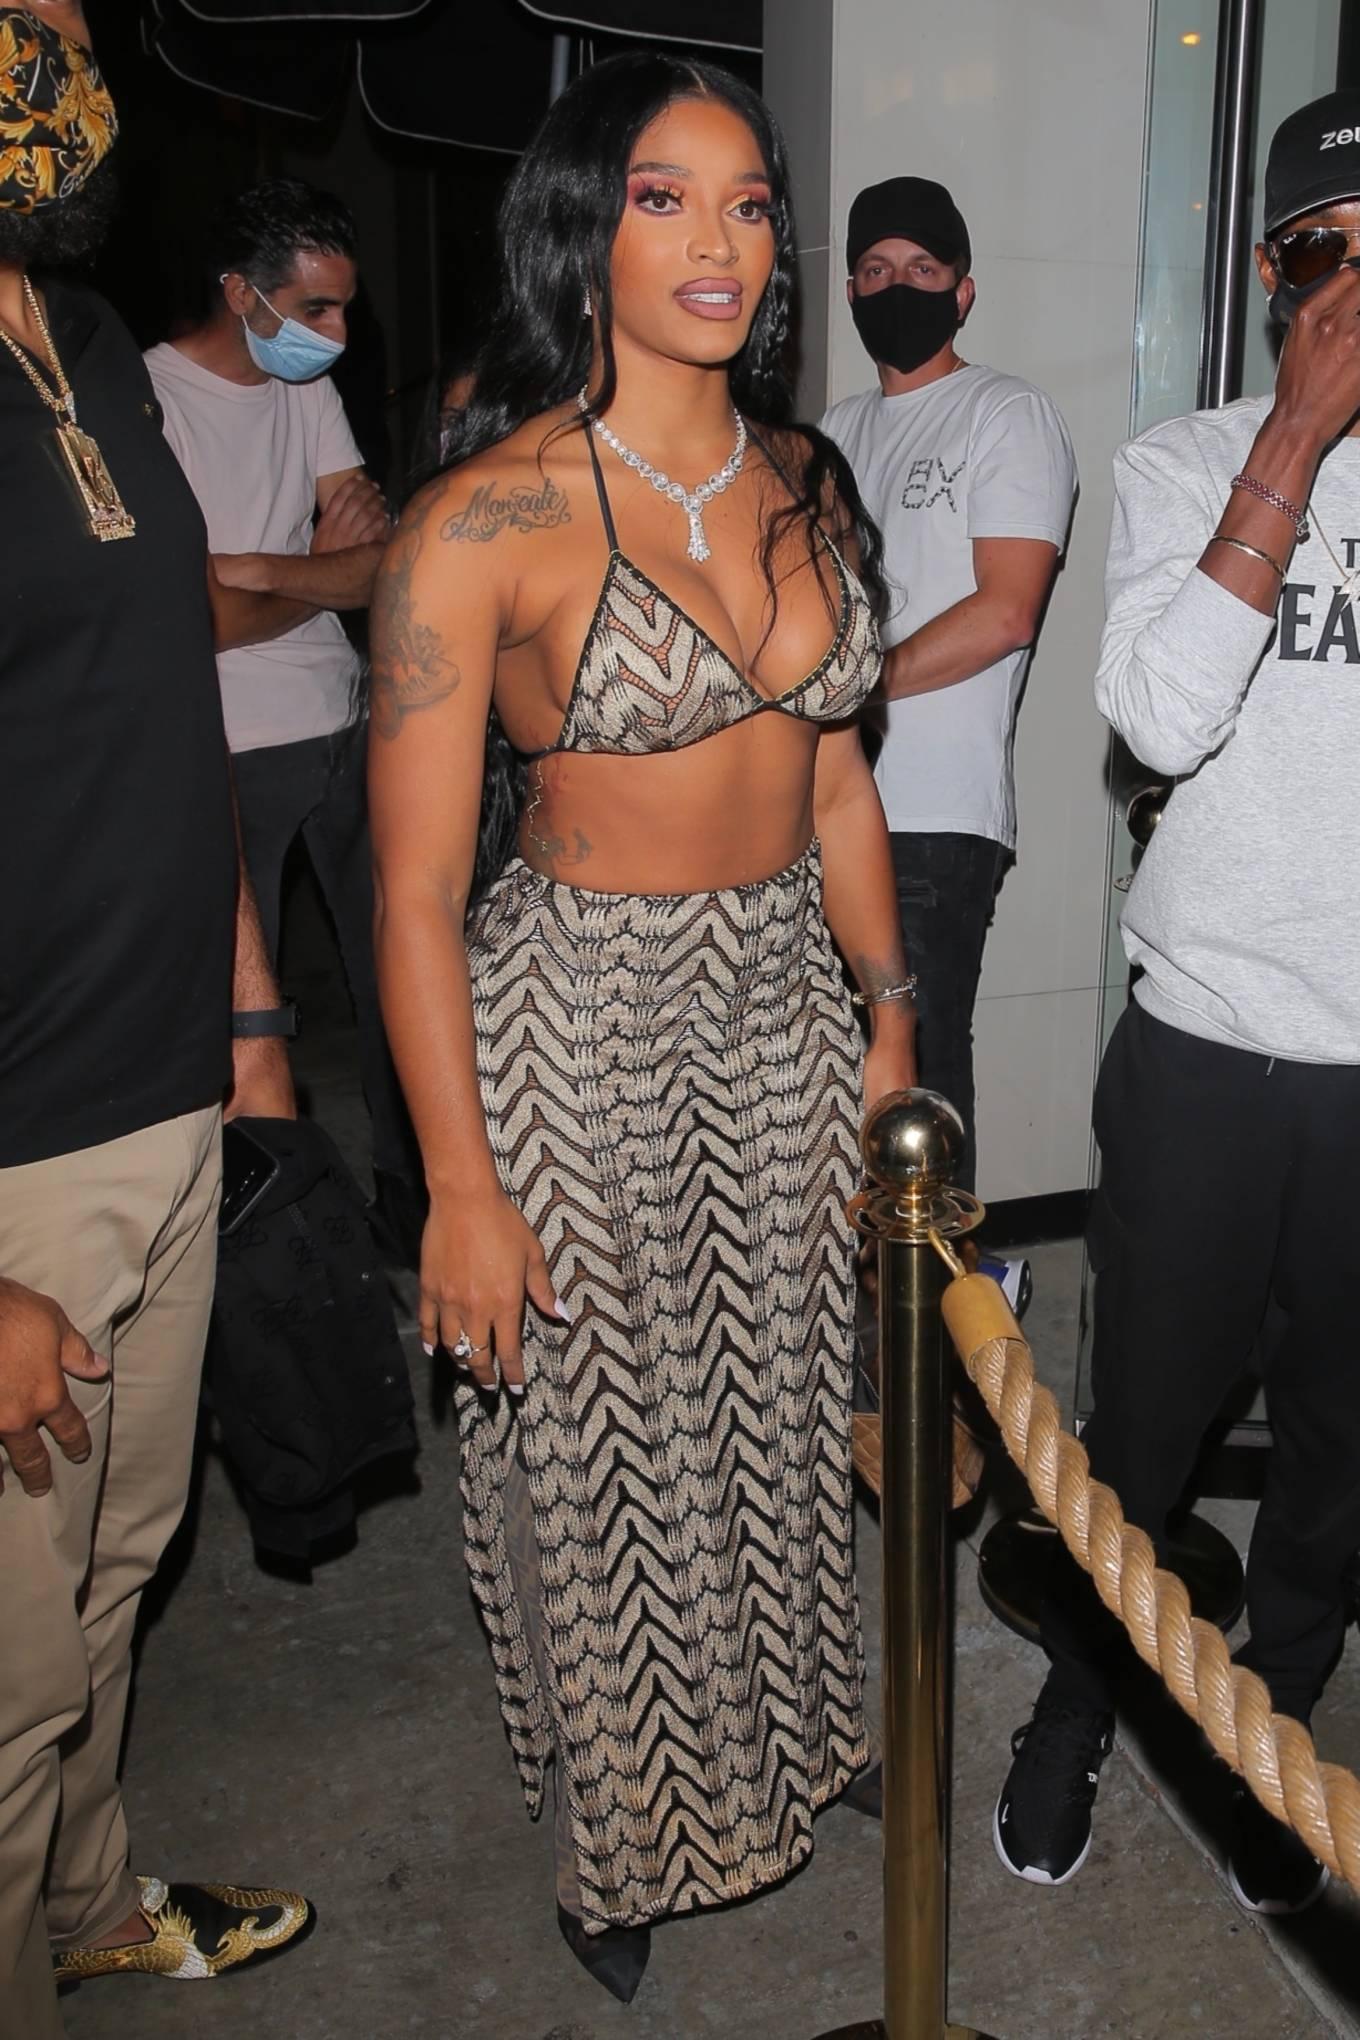 Joseline Hernandez 2021 : Joseline Hernandez – Seen at dinner with husband DJ Ballistic at Catch LA in West Hollywood-52